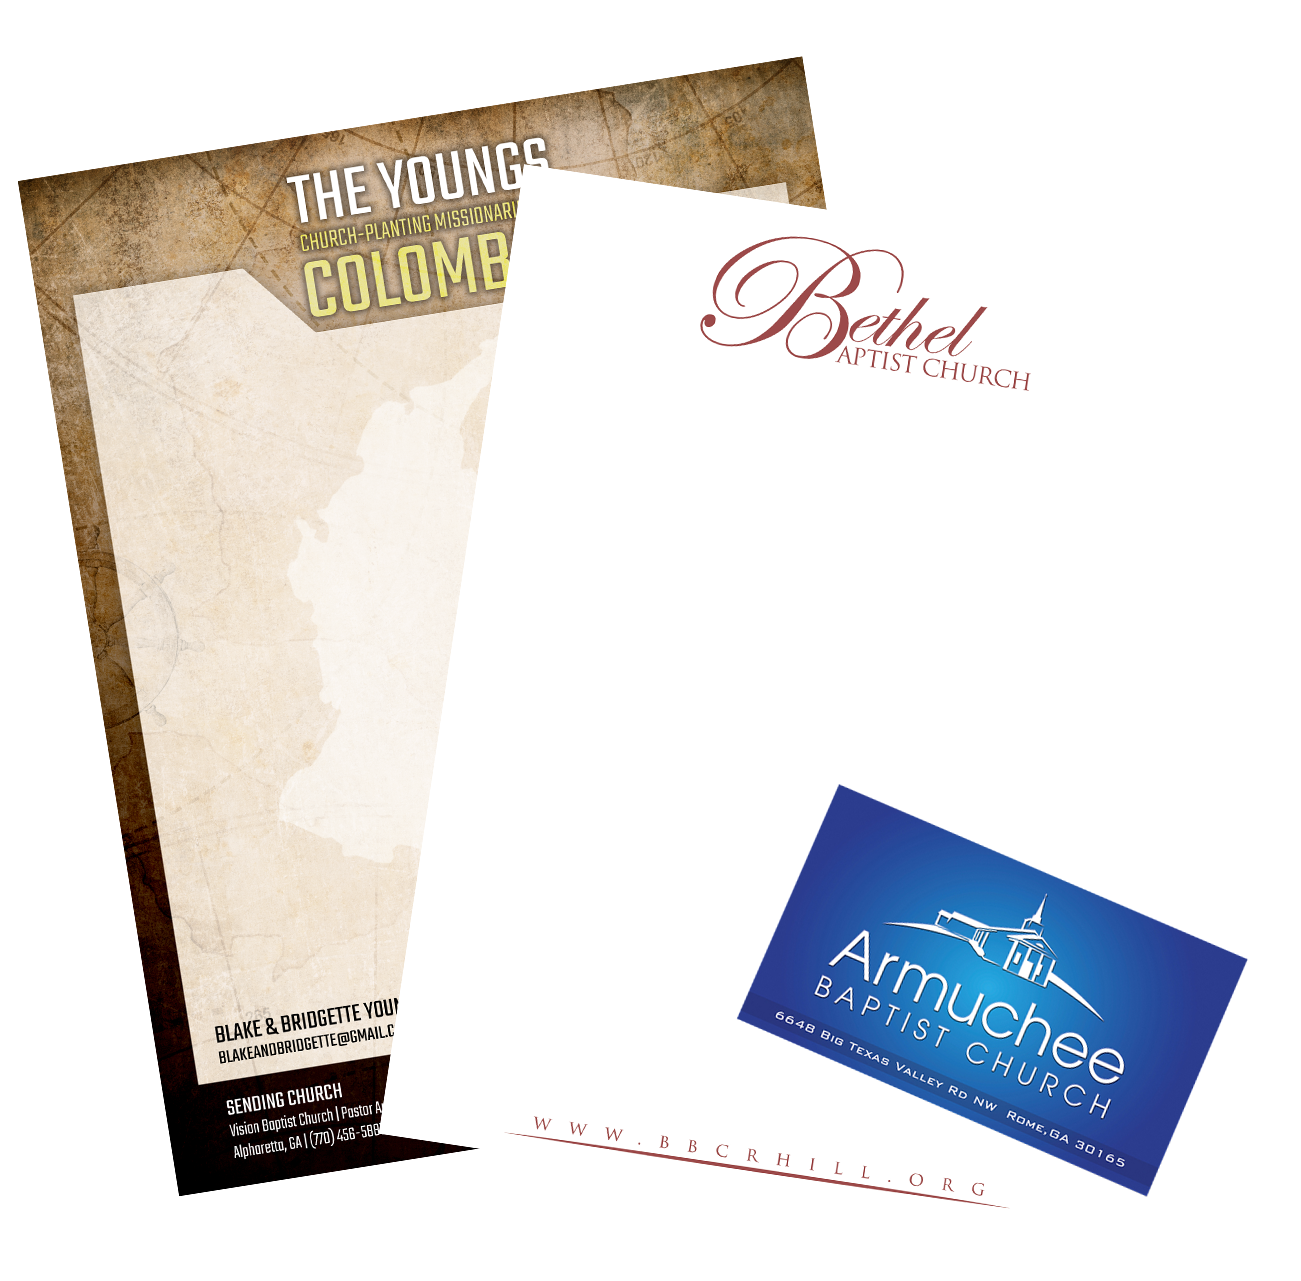 letterhead & Business cards copy